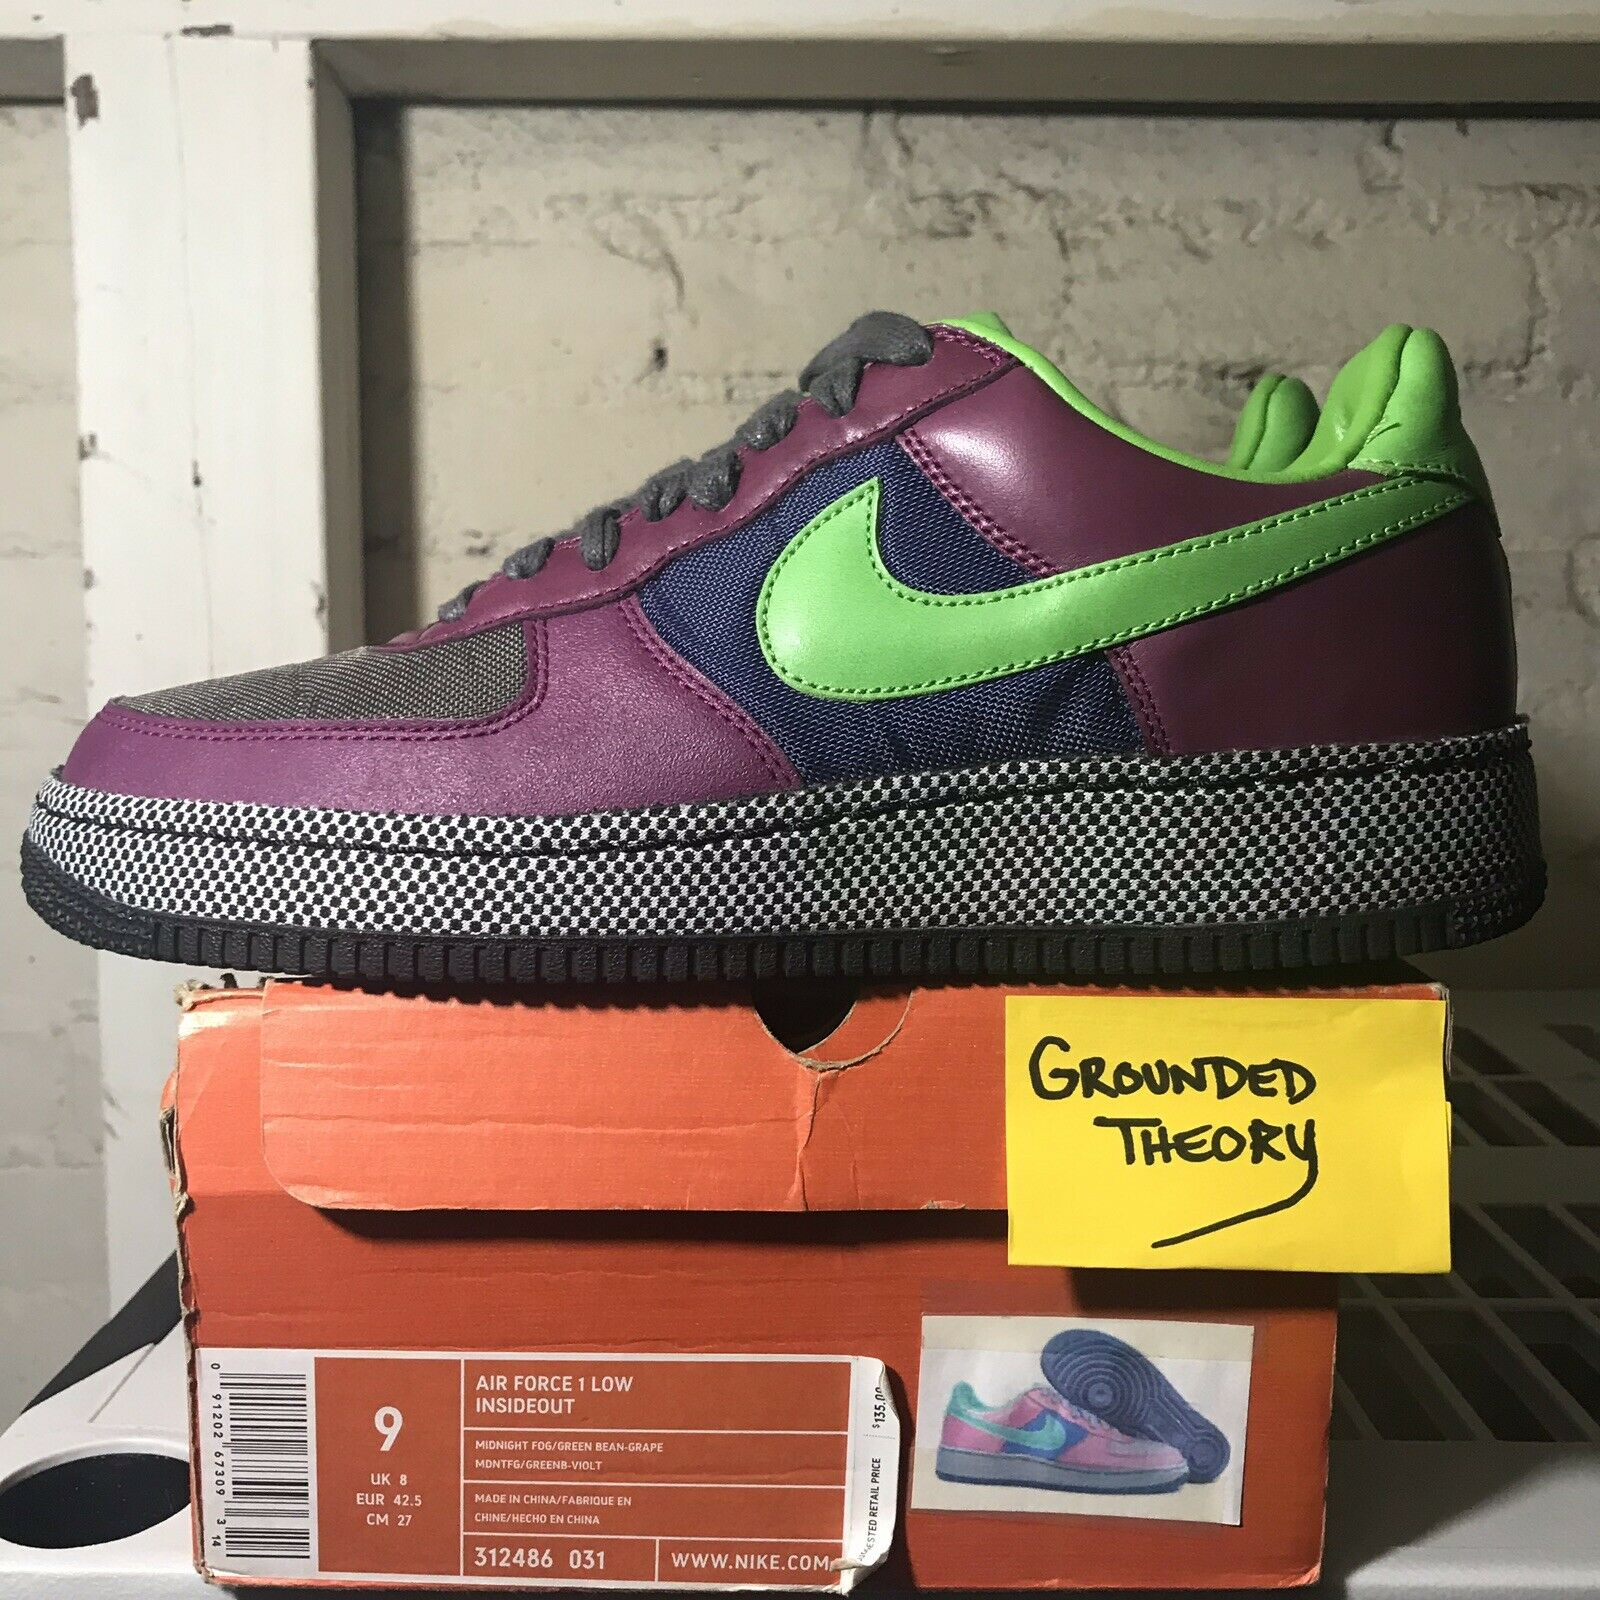 2006 Nike Air Force Low Insideout (312486 -031) Sz  9 Midnight Fog  verdeBean Grape  liquidazione fino al 70%